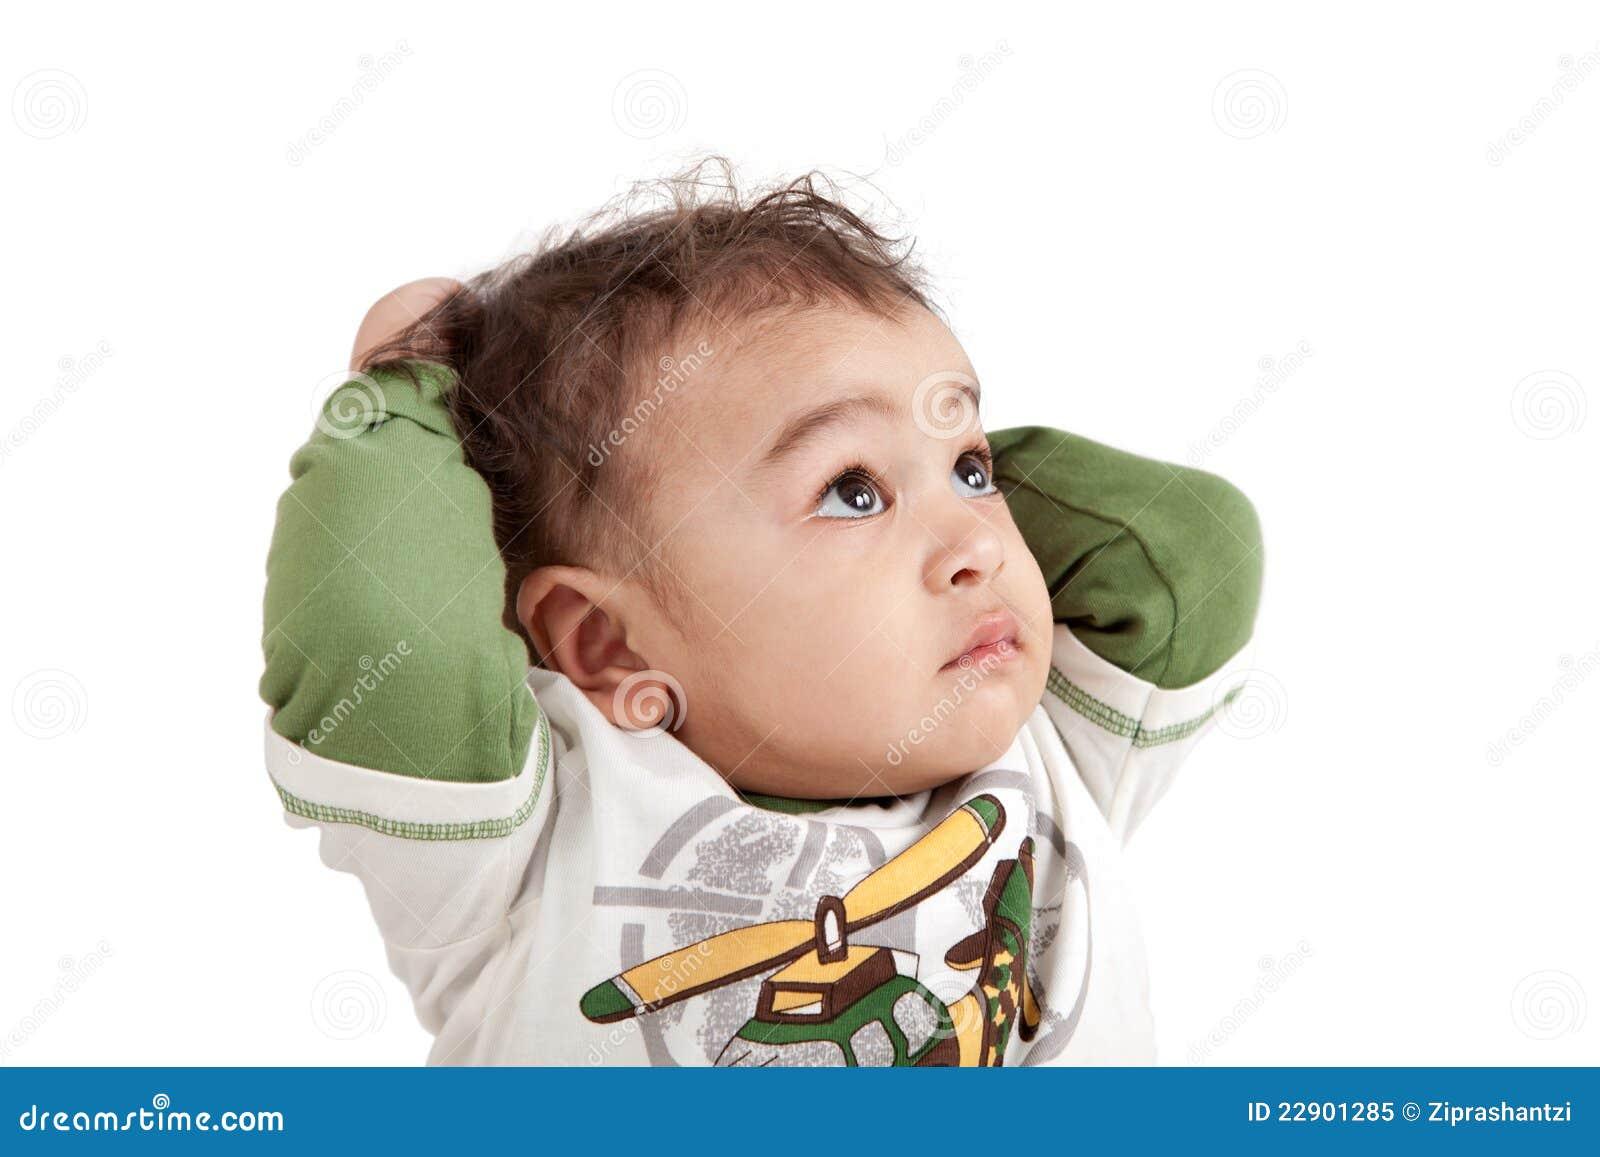 Indian Baby Boy Images Free Download Ilmu Pengetahuan 7